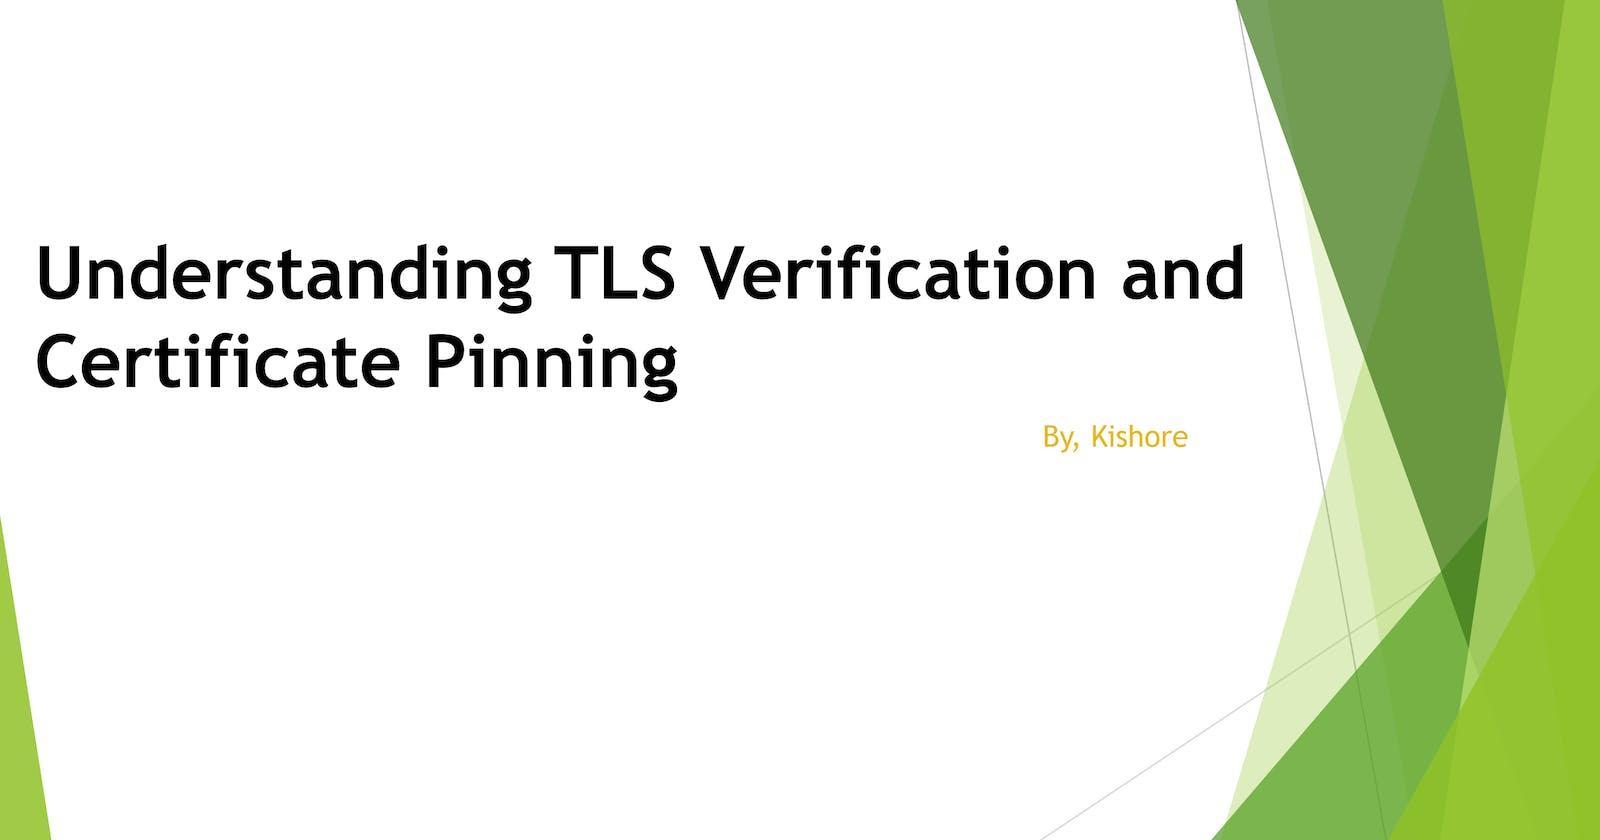 Understanding TLS Verification and Certificate Pinning